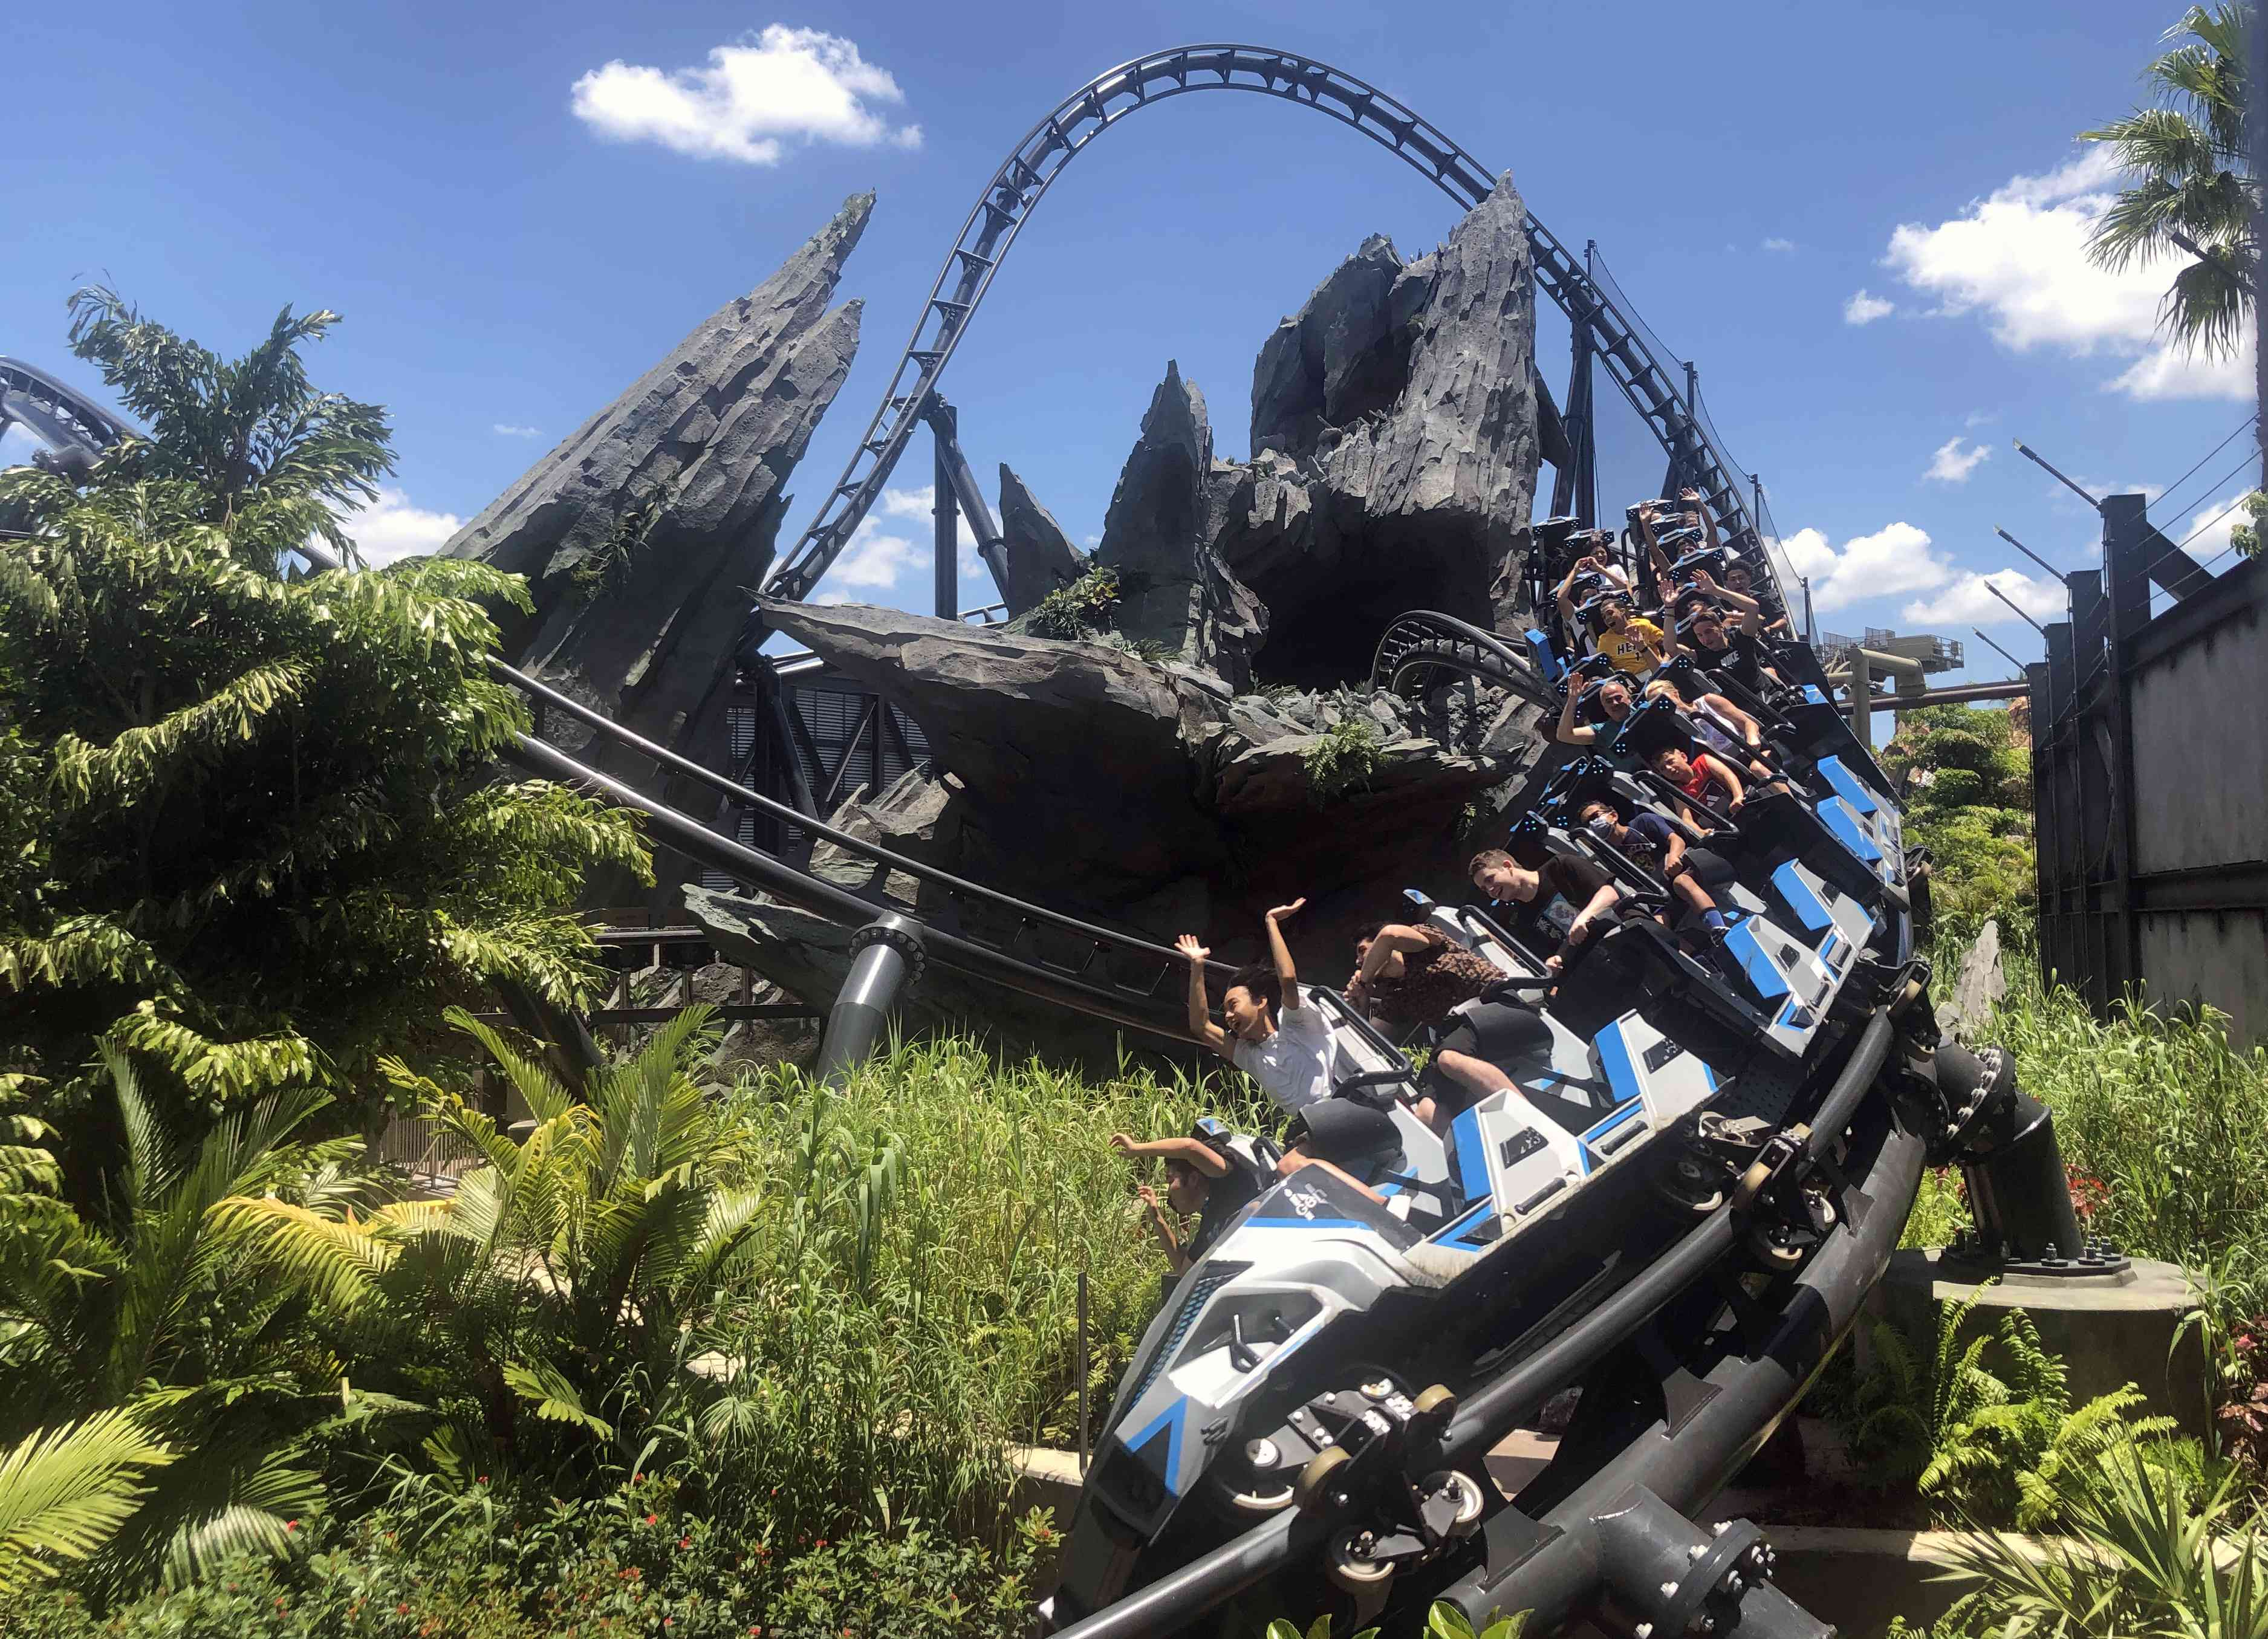 Jurassic World VelociCoaster at Universal Orlando